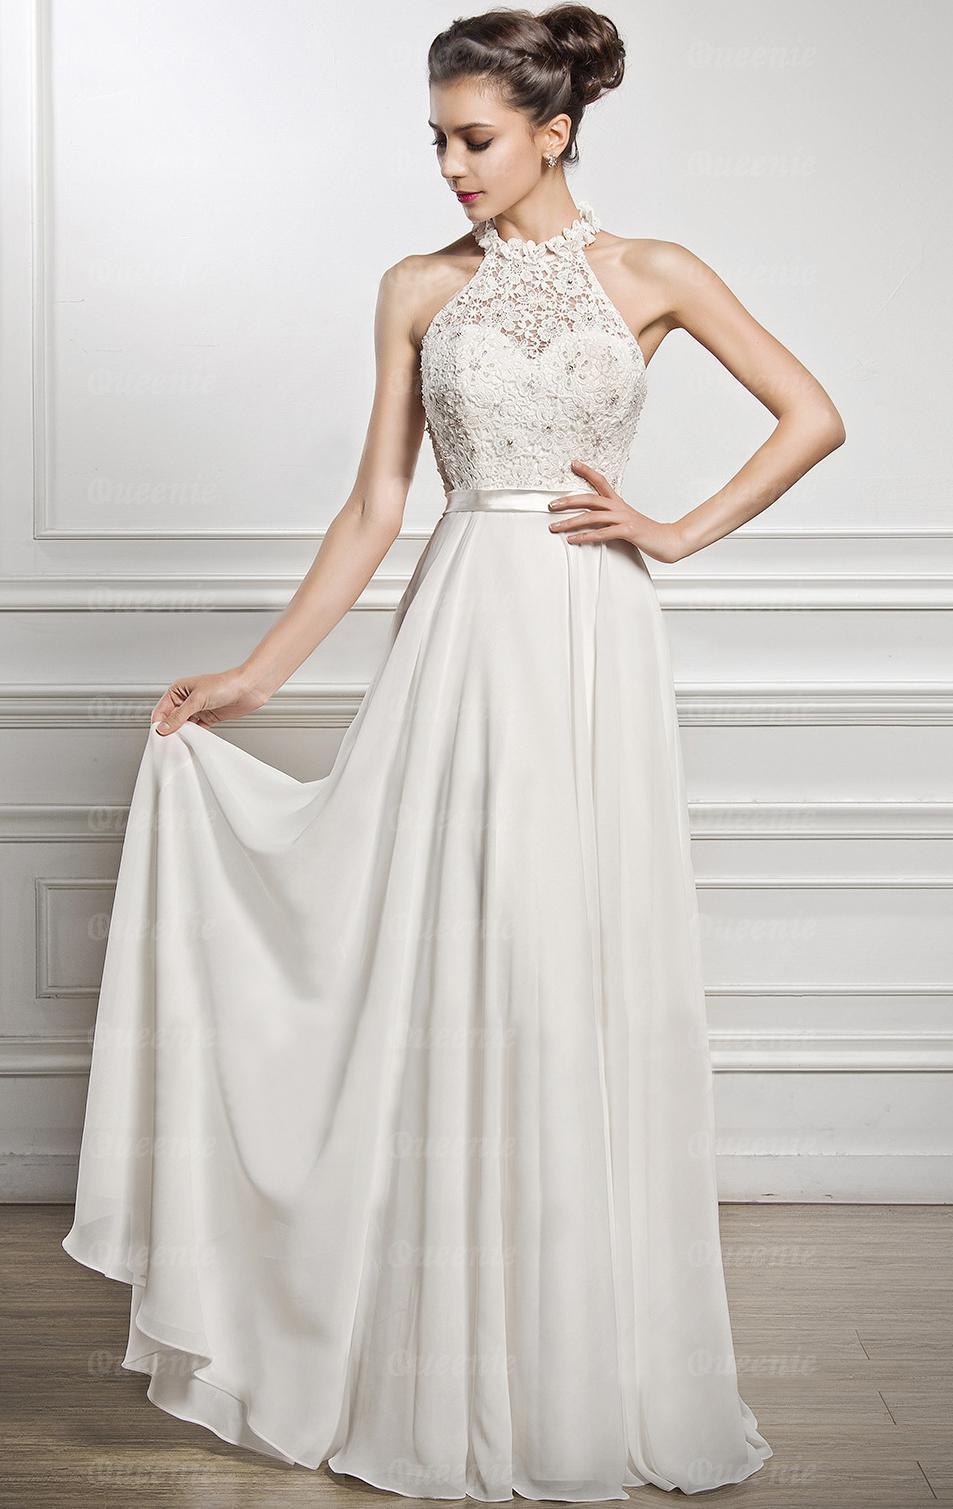 20 Genial Abendkleider In Weiß Stylish Genial Abendkleider In Weiß Design